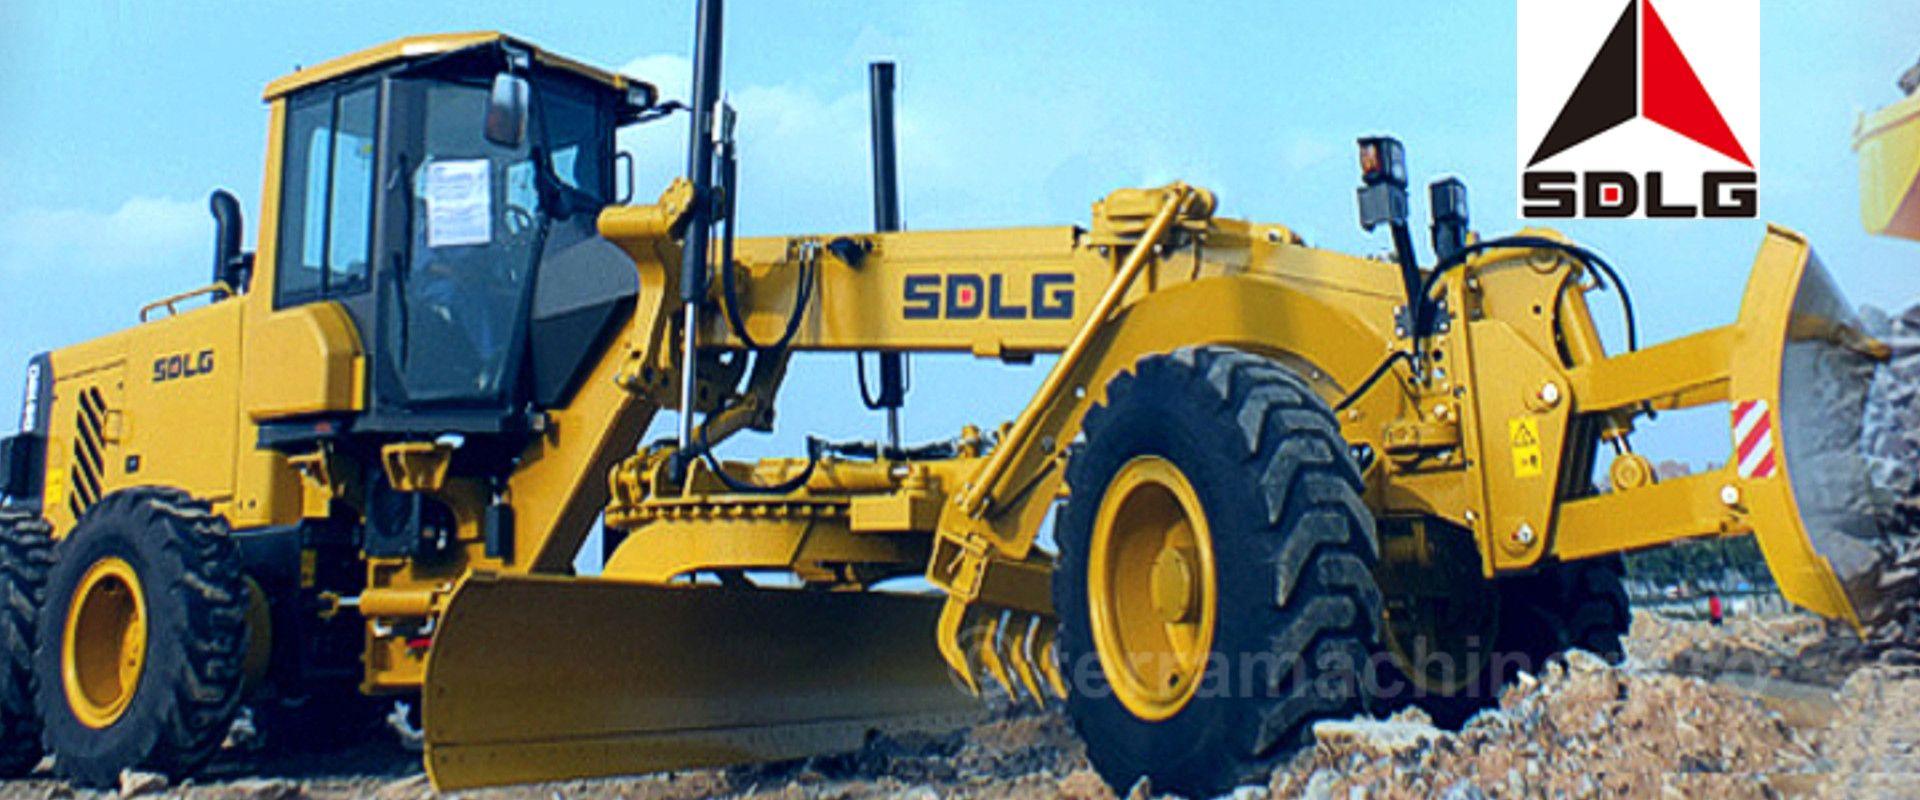 sdlg-buldoexcavatoare-terramachinery-ro-big-banner.jpg slider image 5